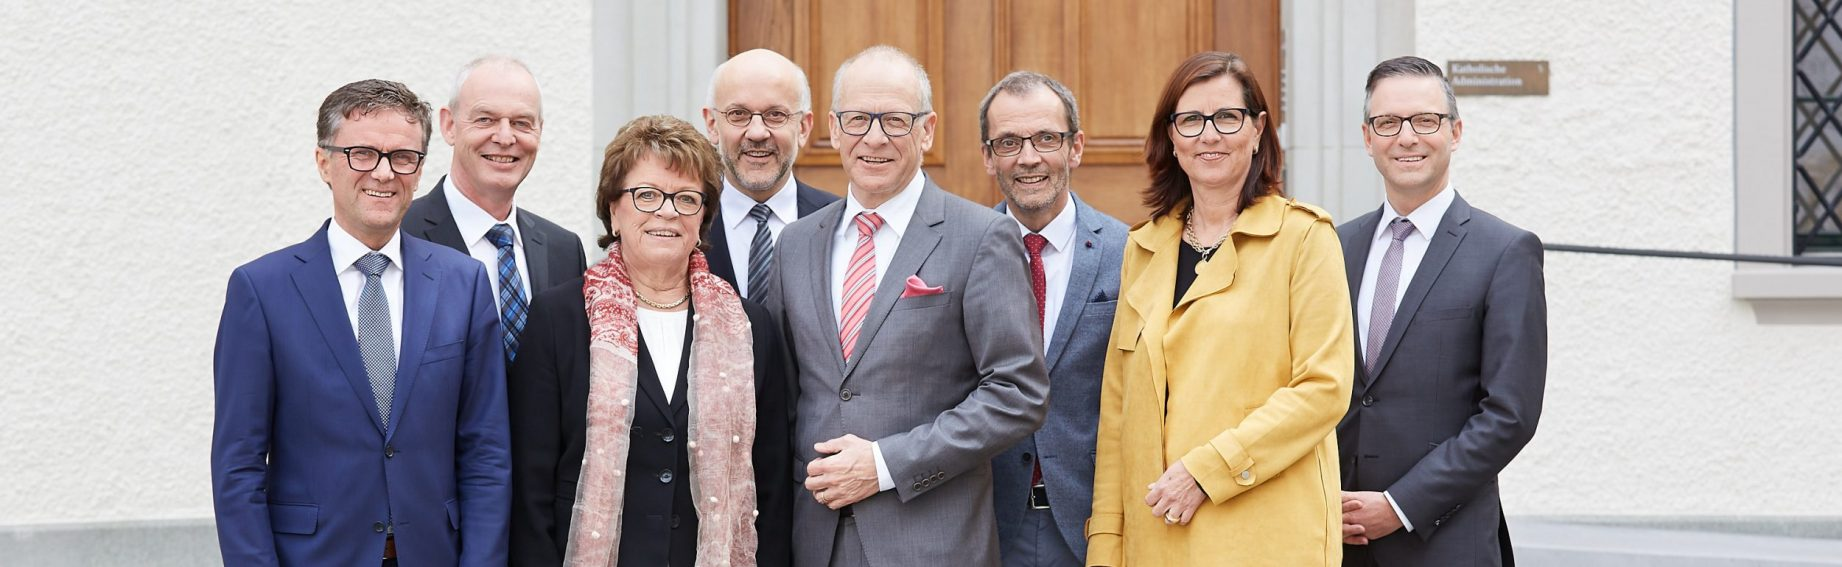 Administrationsrat Gruppenbild 2